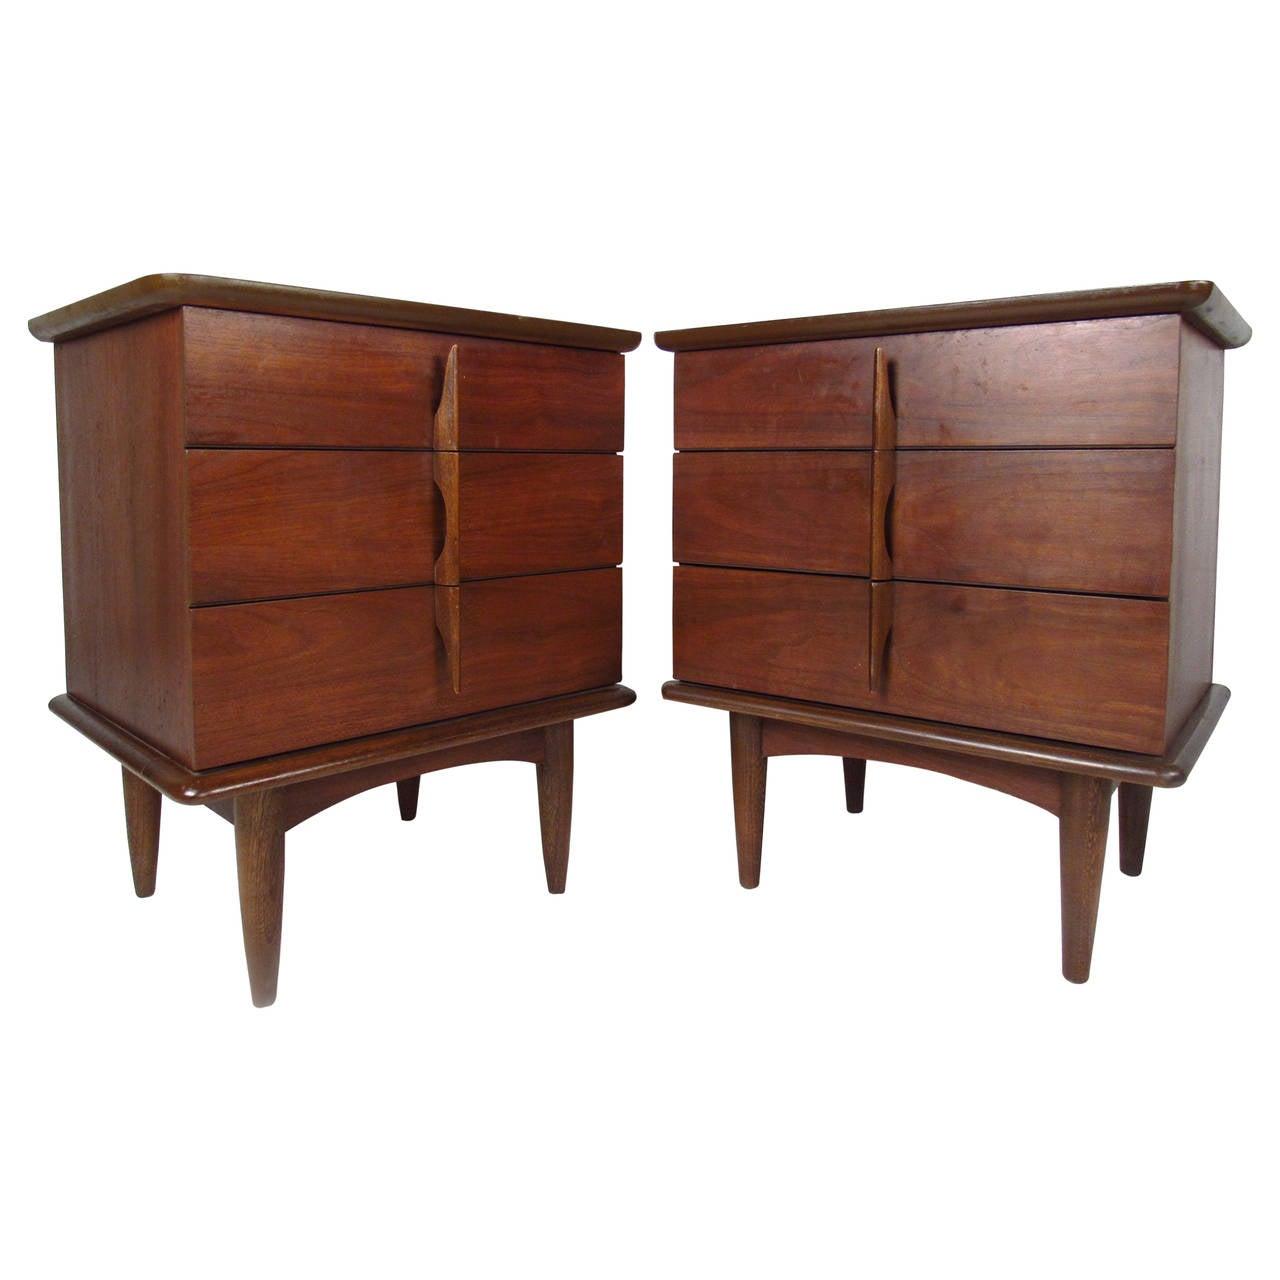 Mid century modern american walnut night stands at 1stdibs for American walnut bedroom furniture